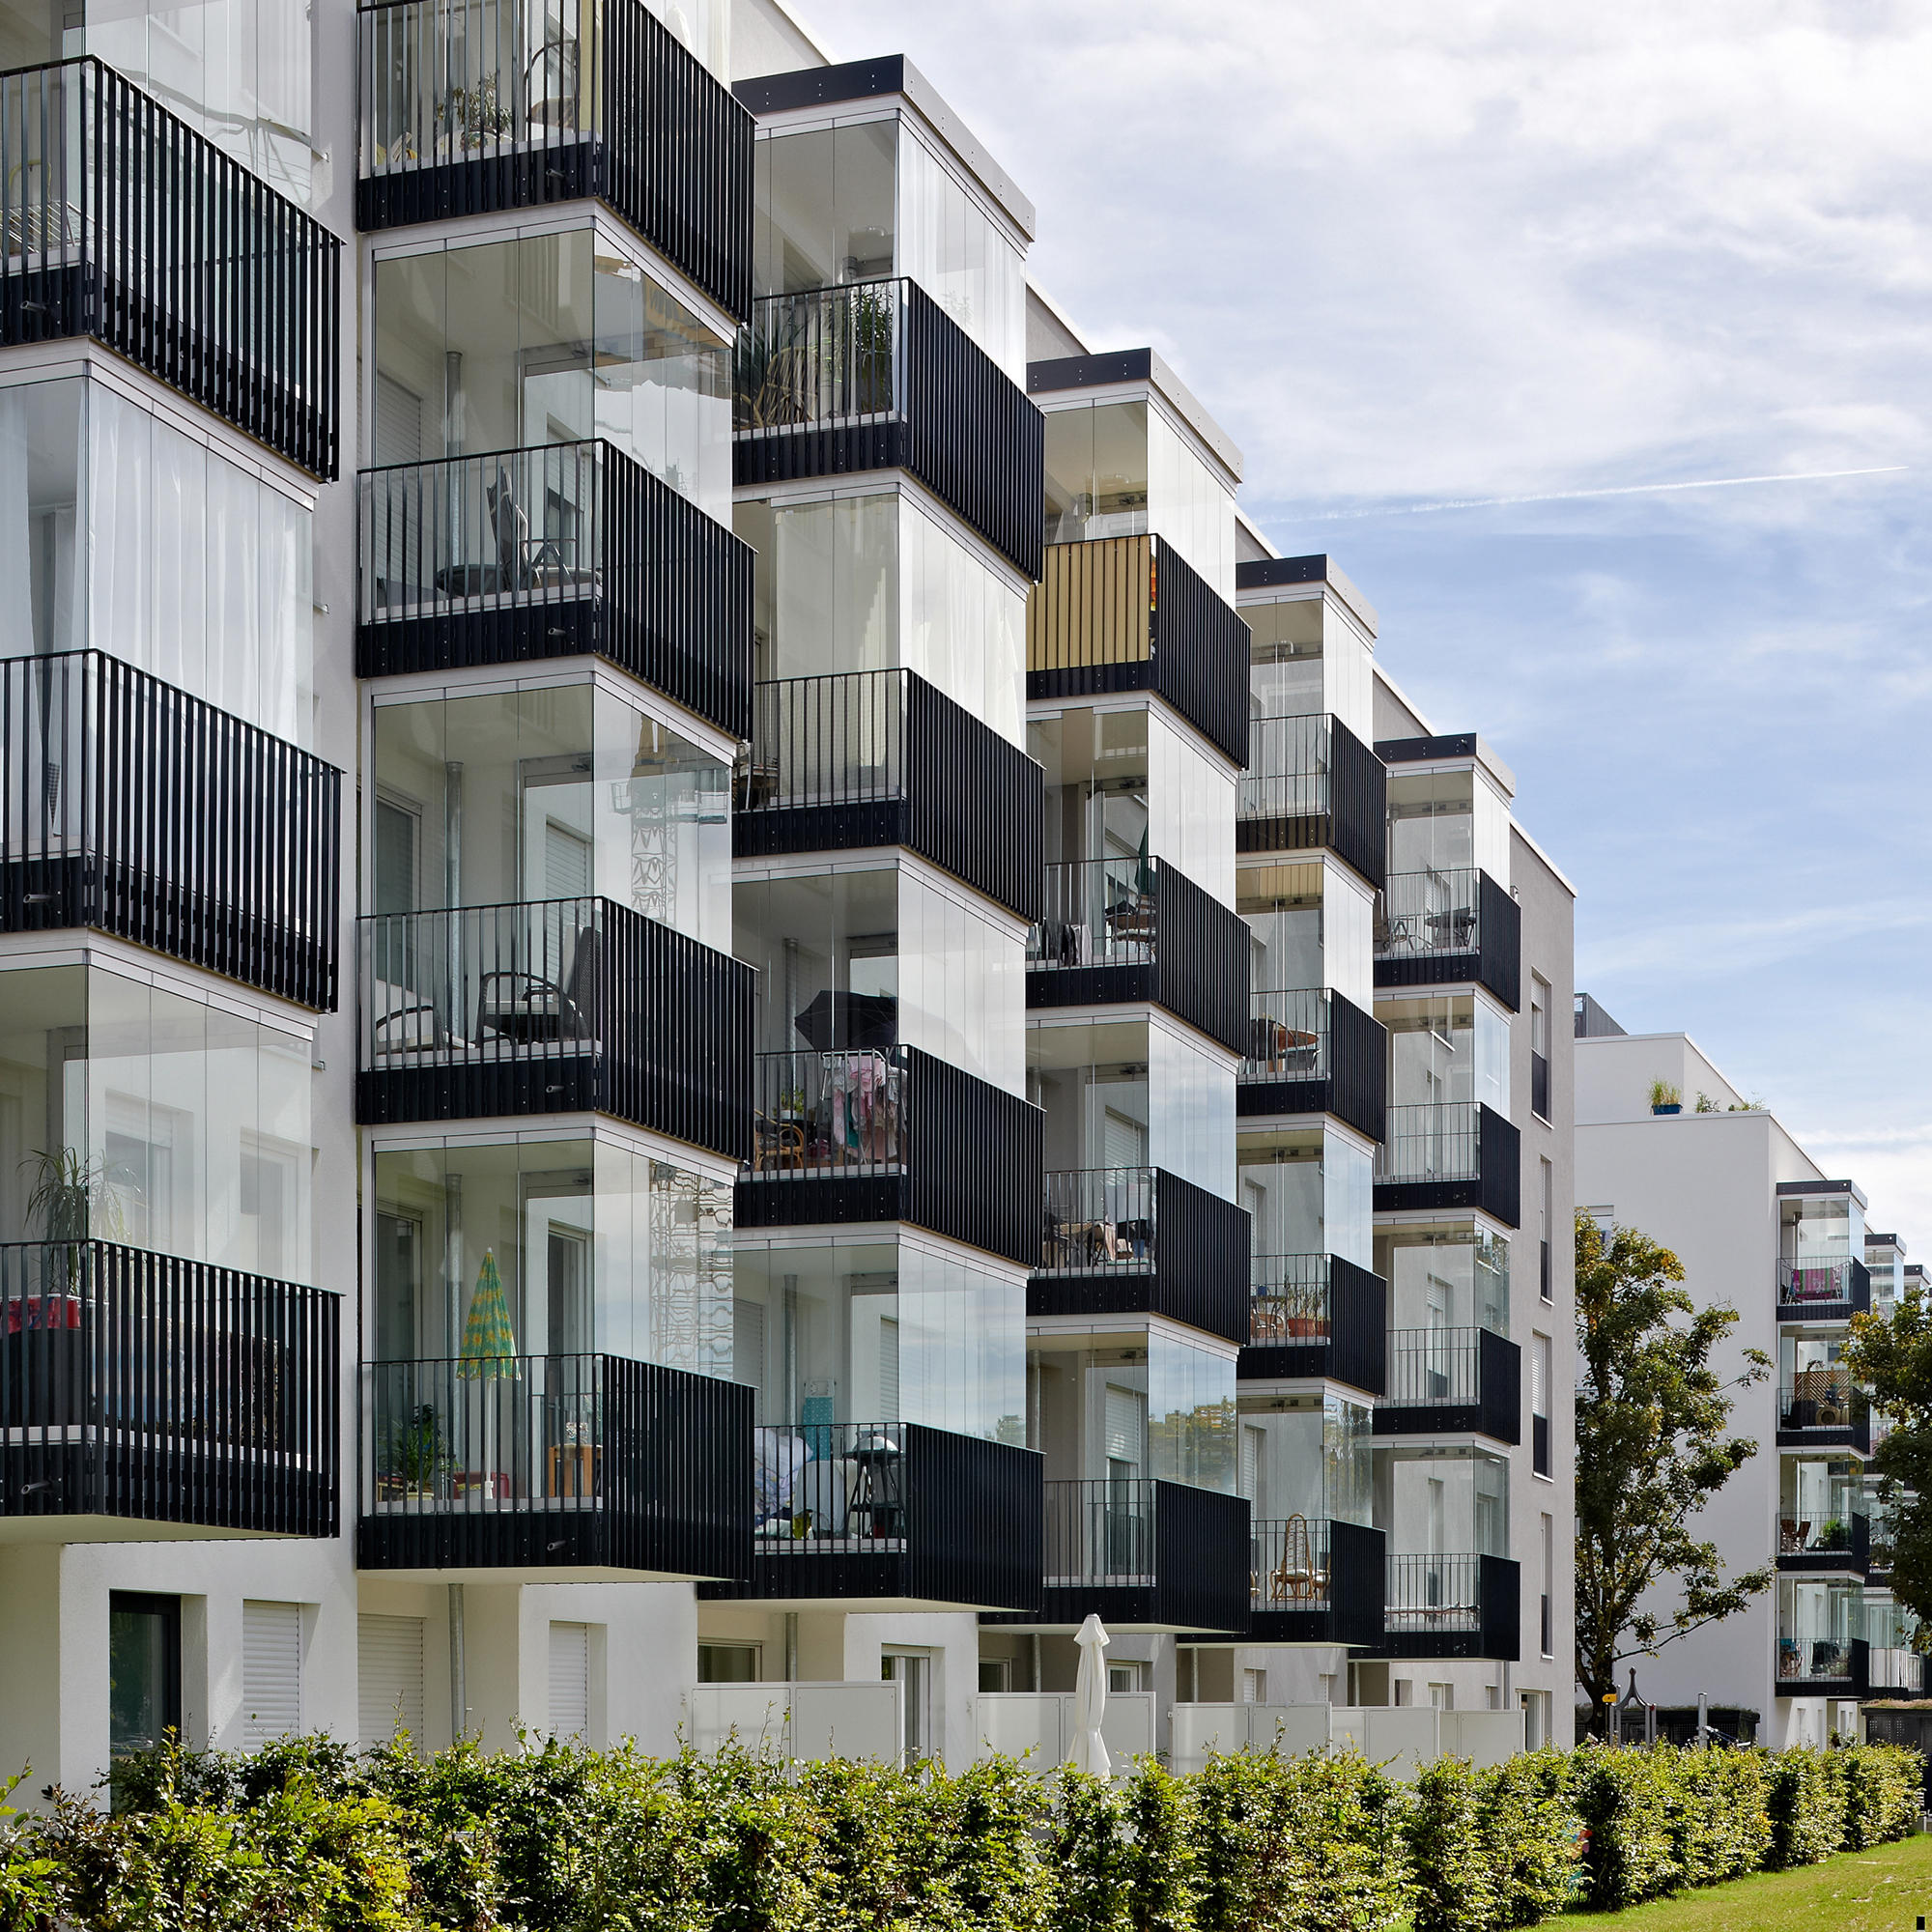 balcony glasing sl 25 xxl vitrages de balcons de. Black Bedroom Furniture Sets. Home Design Ideas